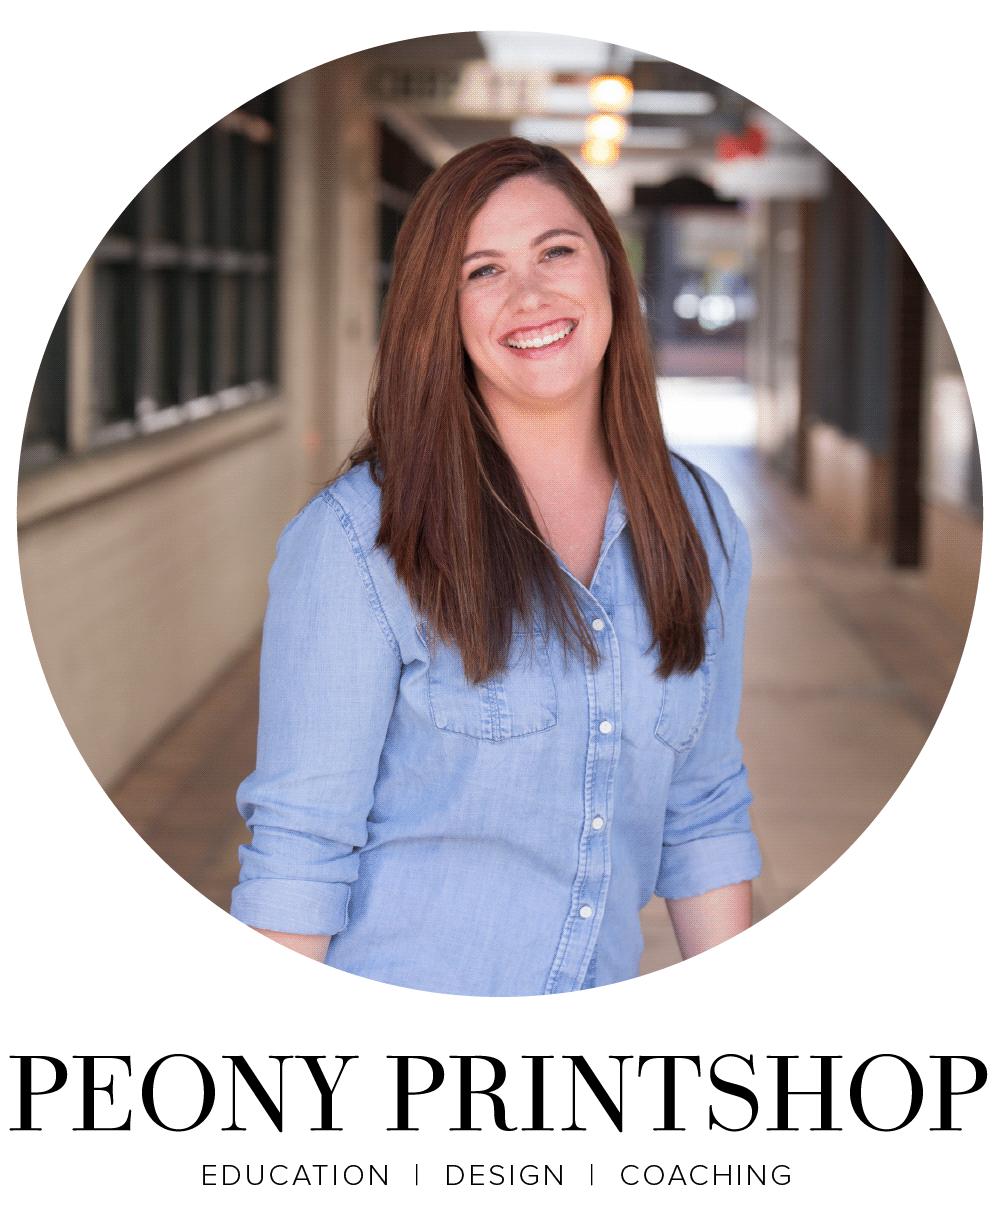 Peony Printshop    Education   Design   Coaching